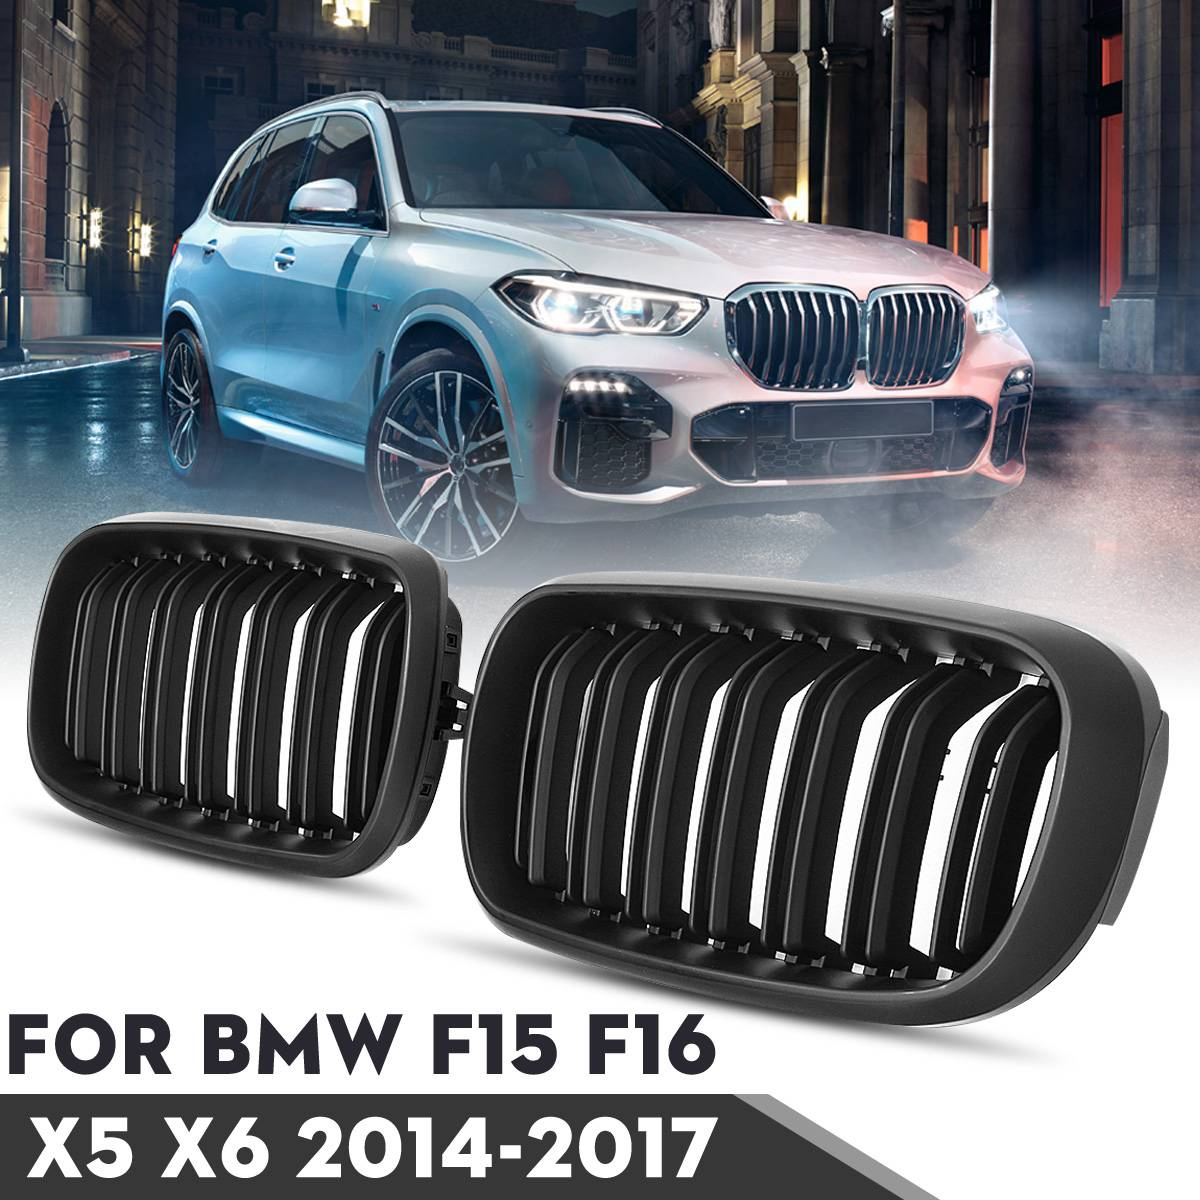 1 paar Auto Glänzend/Matt Schwarz Front Stoßstange Doppel 2 Lamellen Niere Gitter Für BMW F15 F16 X5 X6 f85 F86 X5M X6M 2014-2017 Gitter